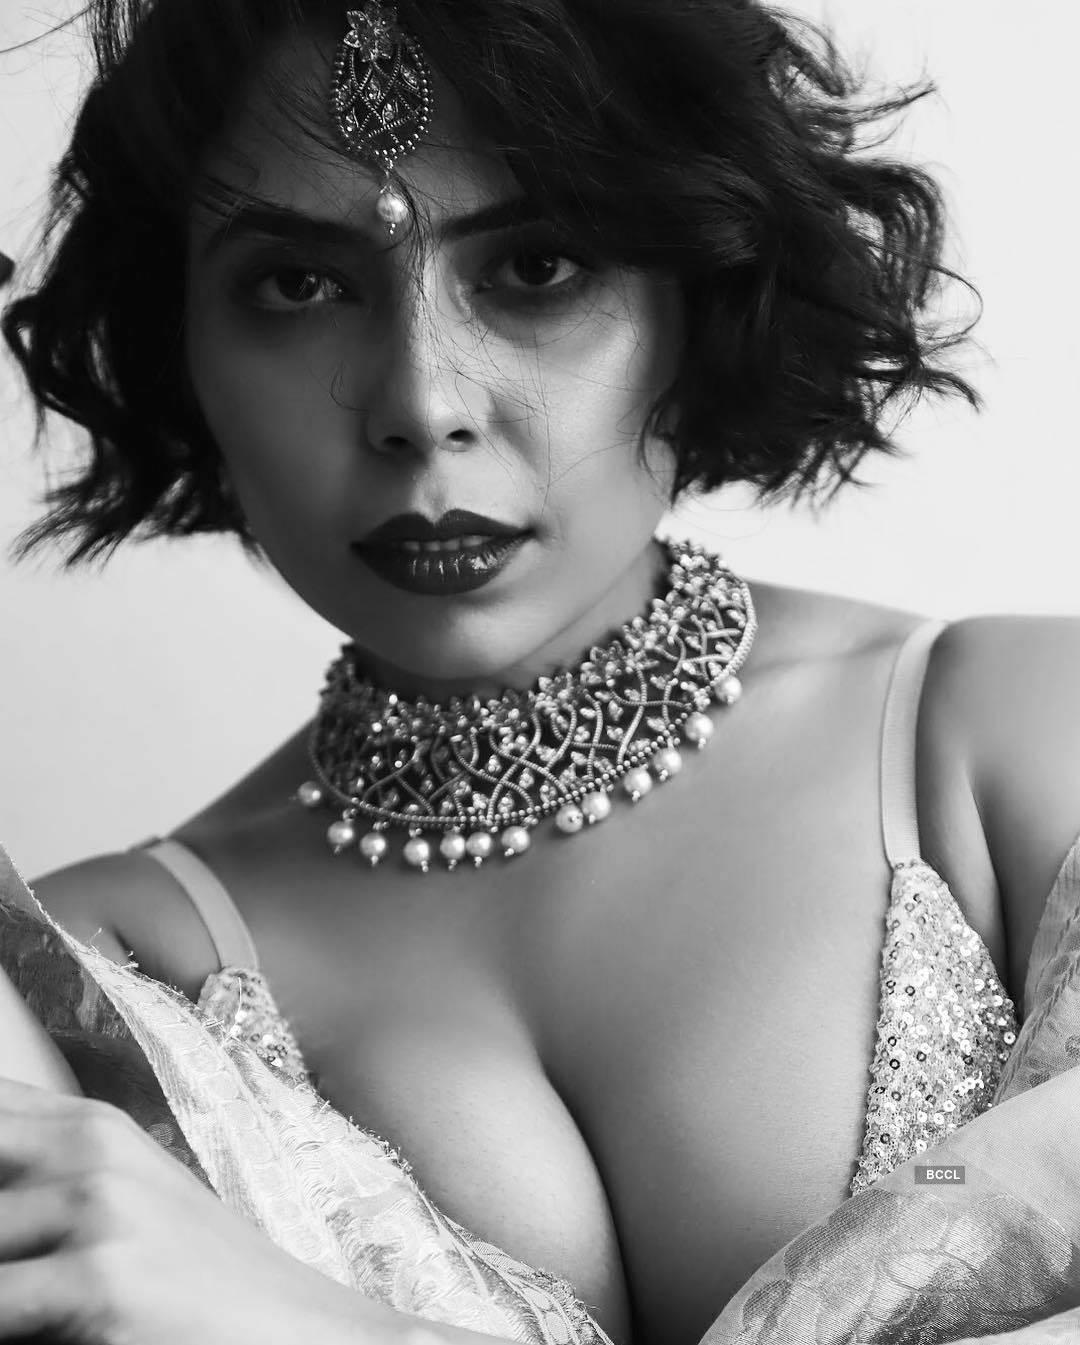 Pictures of Farrah Kader shake up the internet!